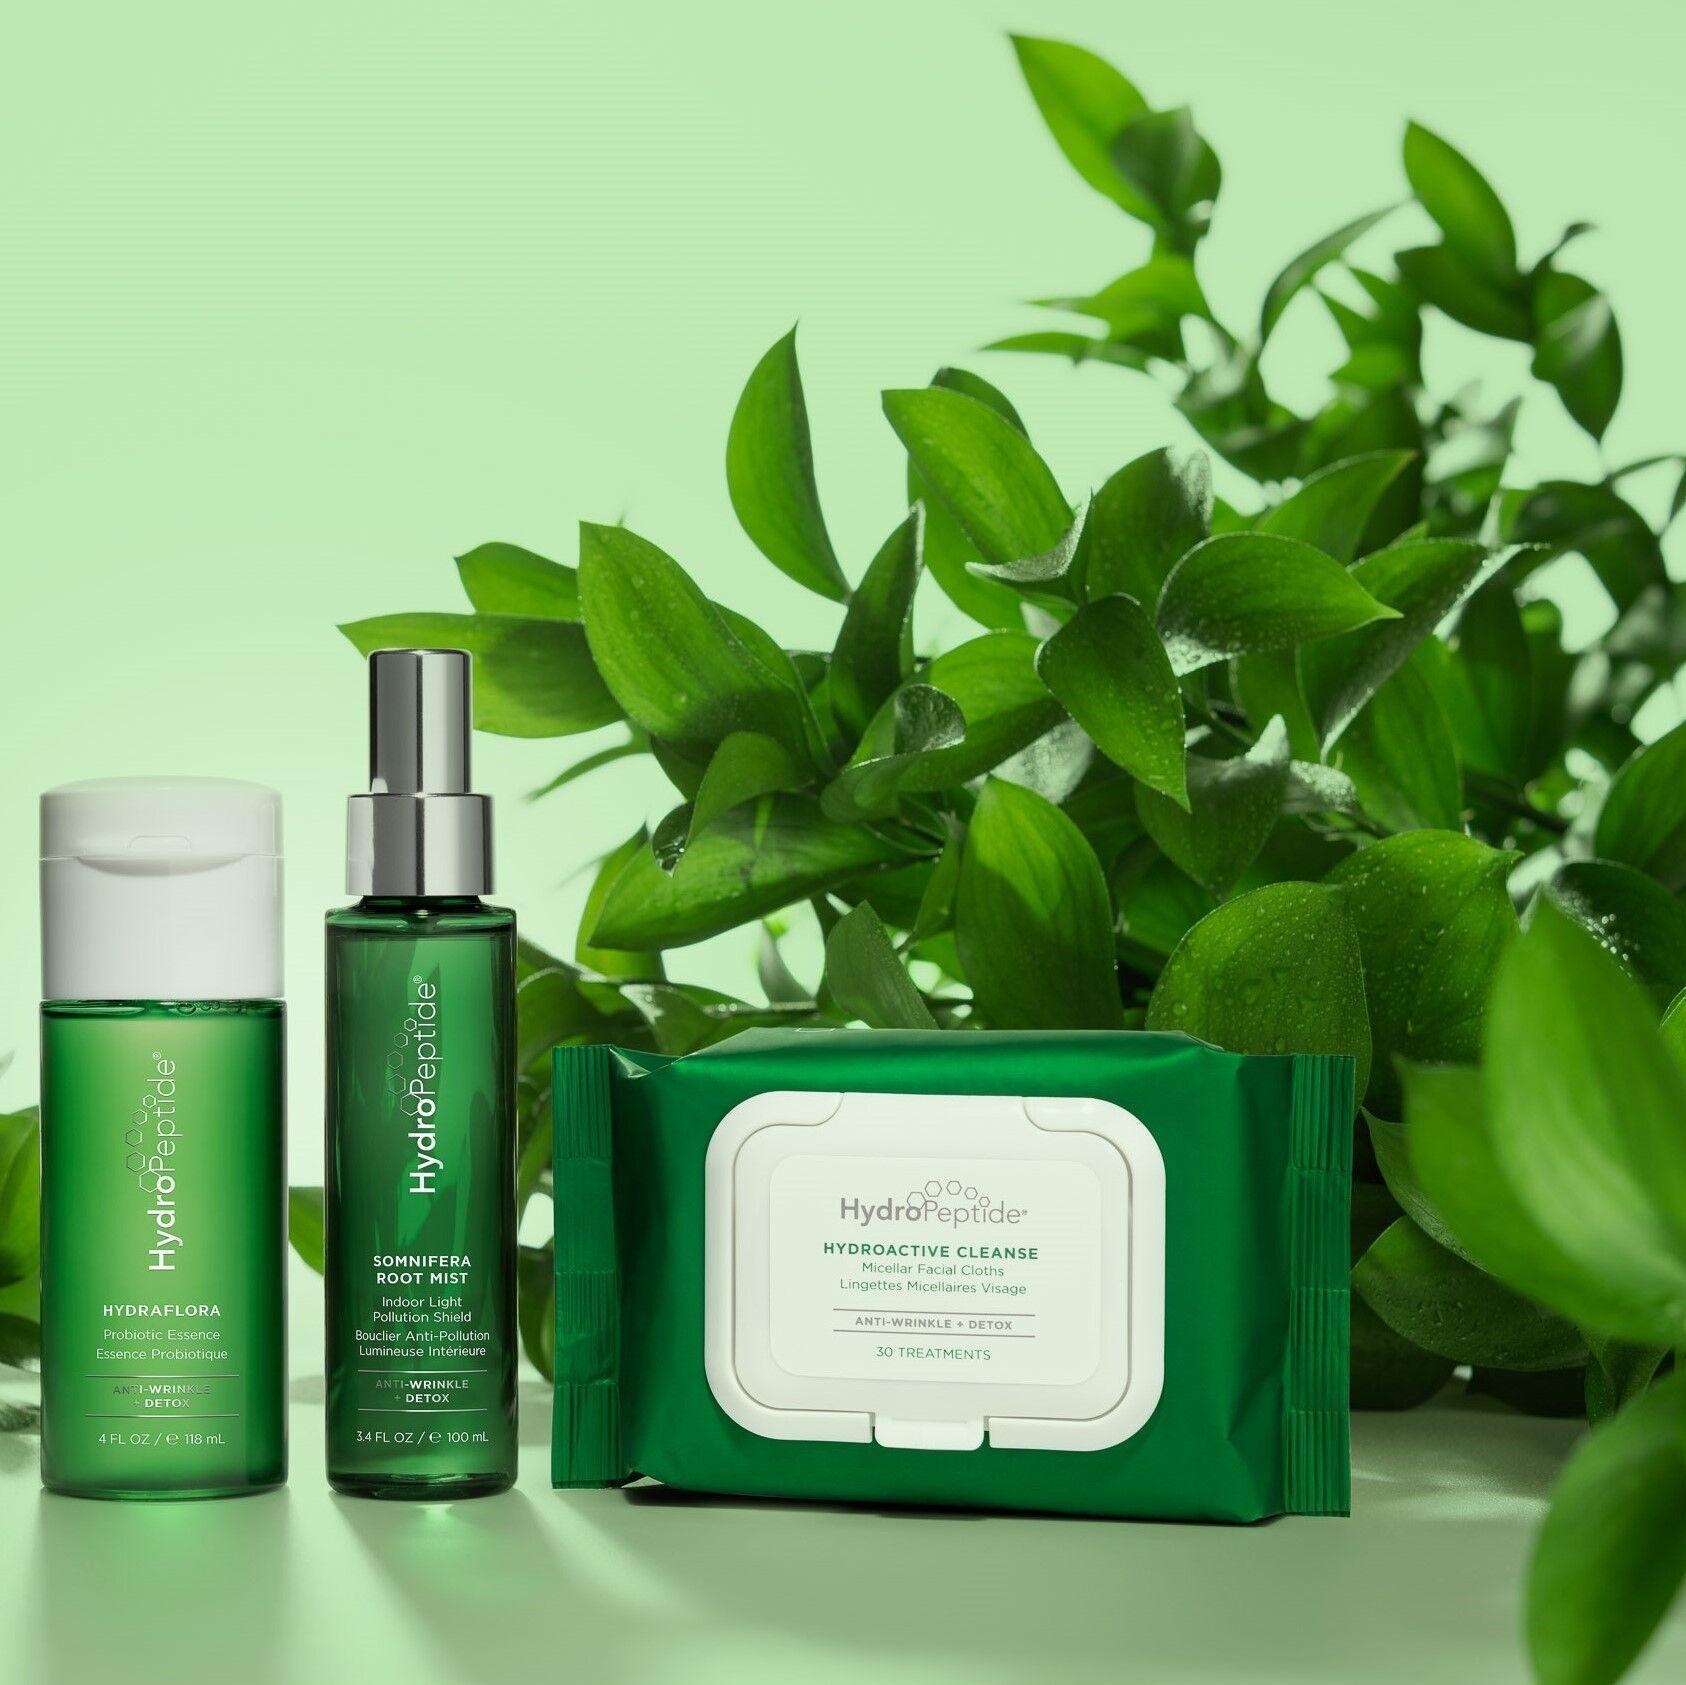 botox noosa dermal filler cosmetic girl 2 luxe skin co clinic hydropeptide